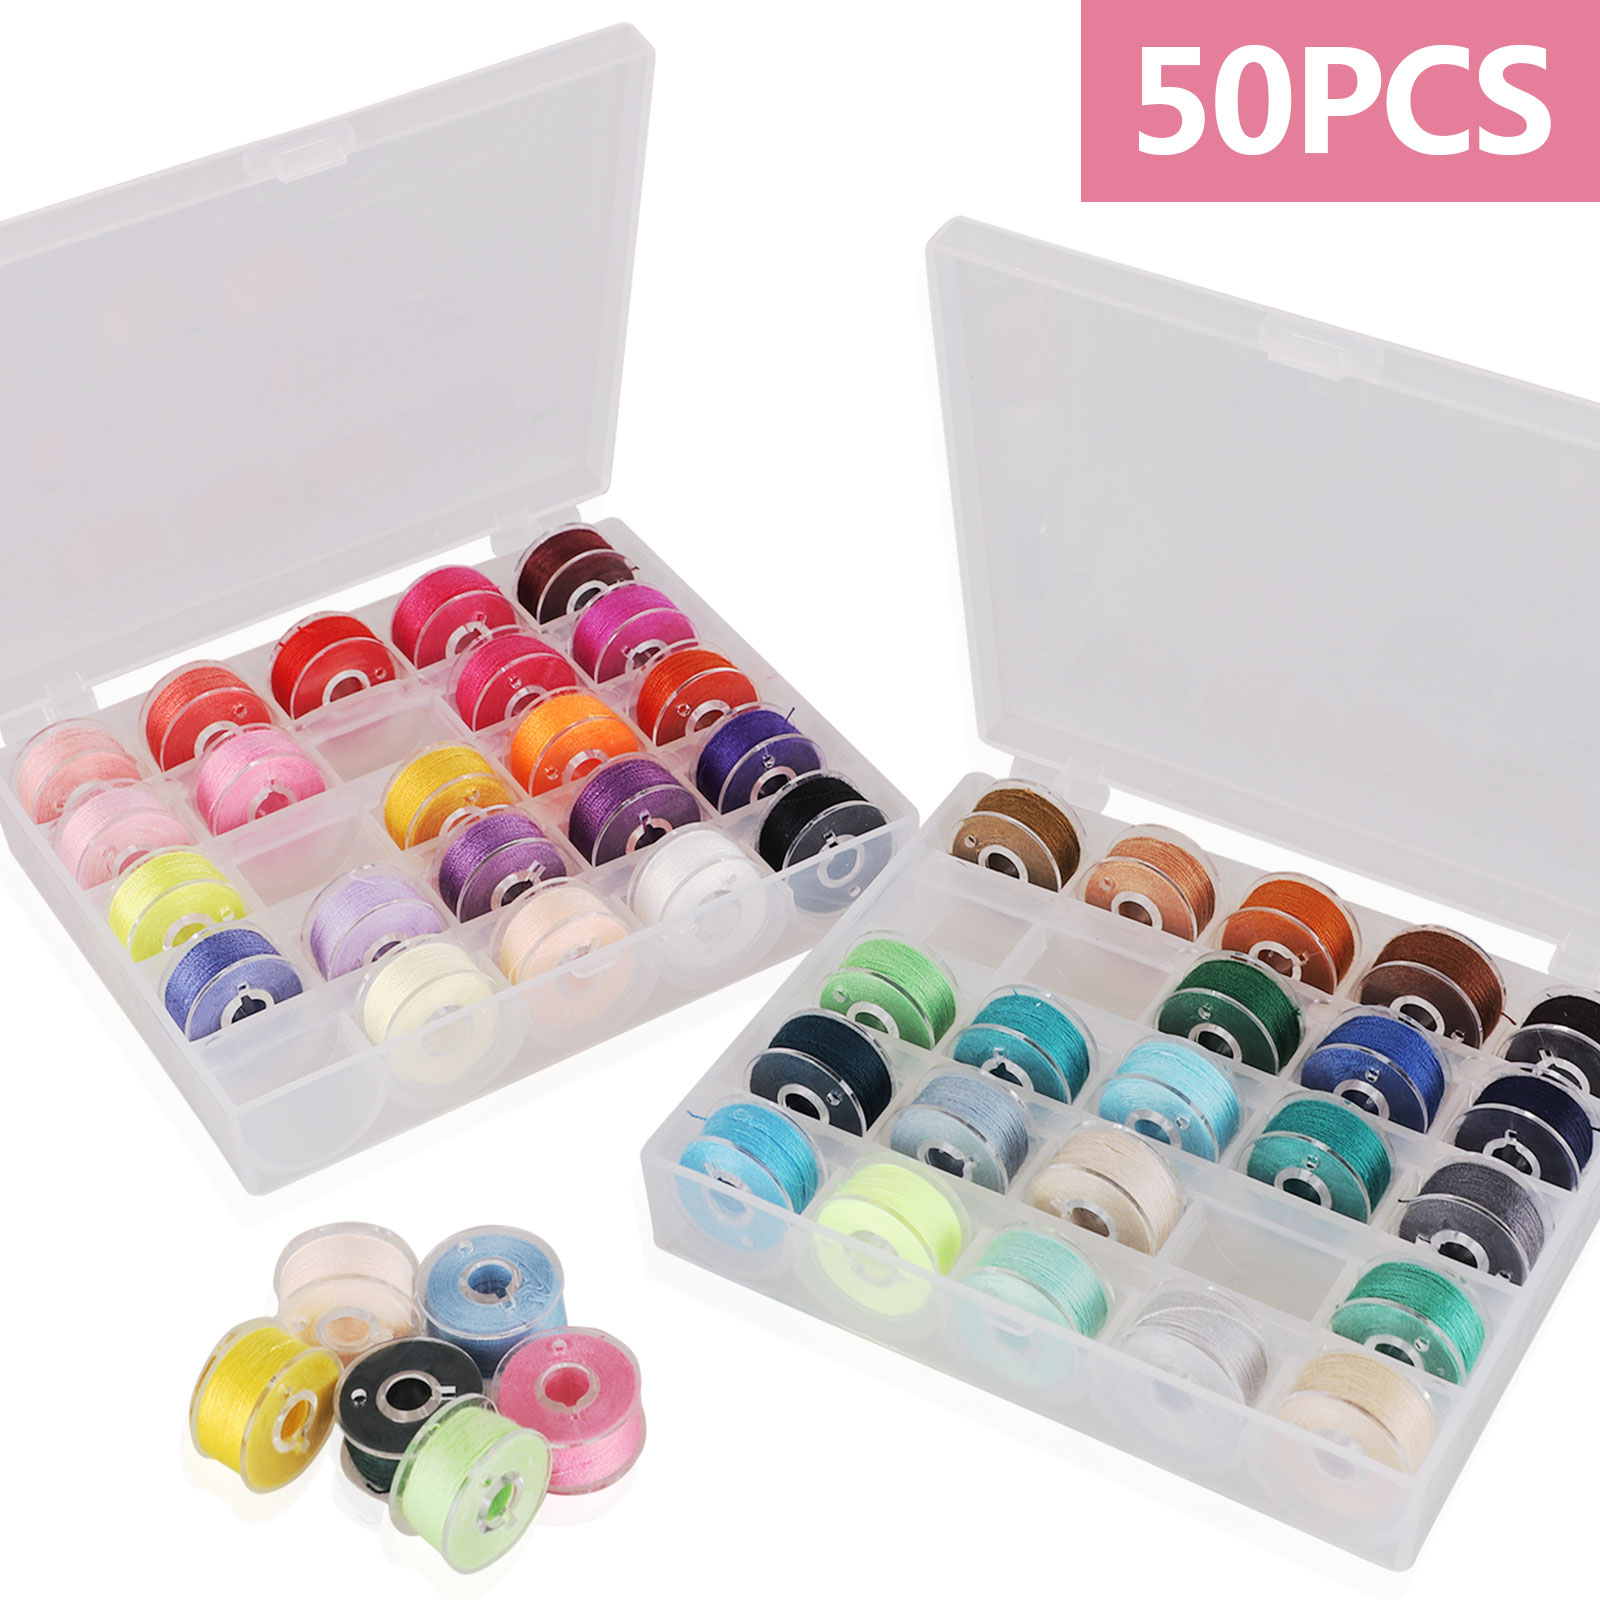 TOP QUALITY Plastic Bobbin Storage Box 50 COLOUR BOBBINS Fits MOST JANOME